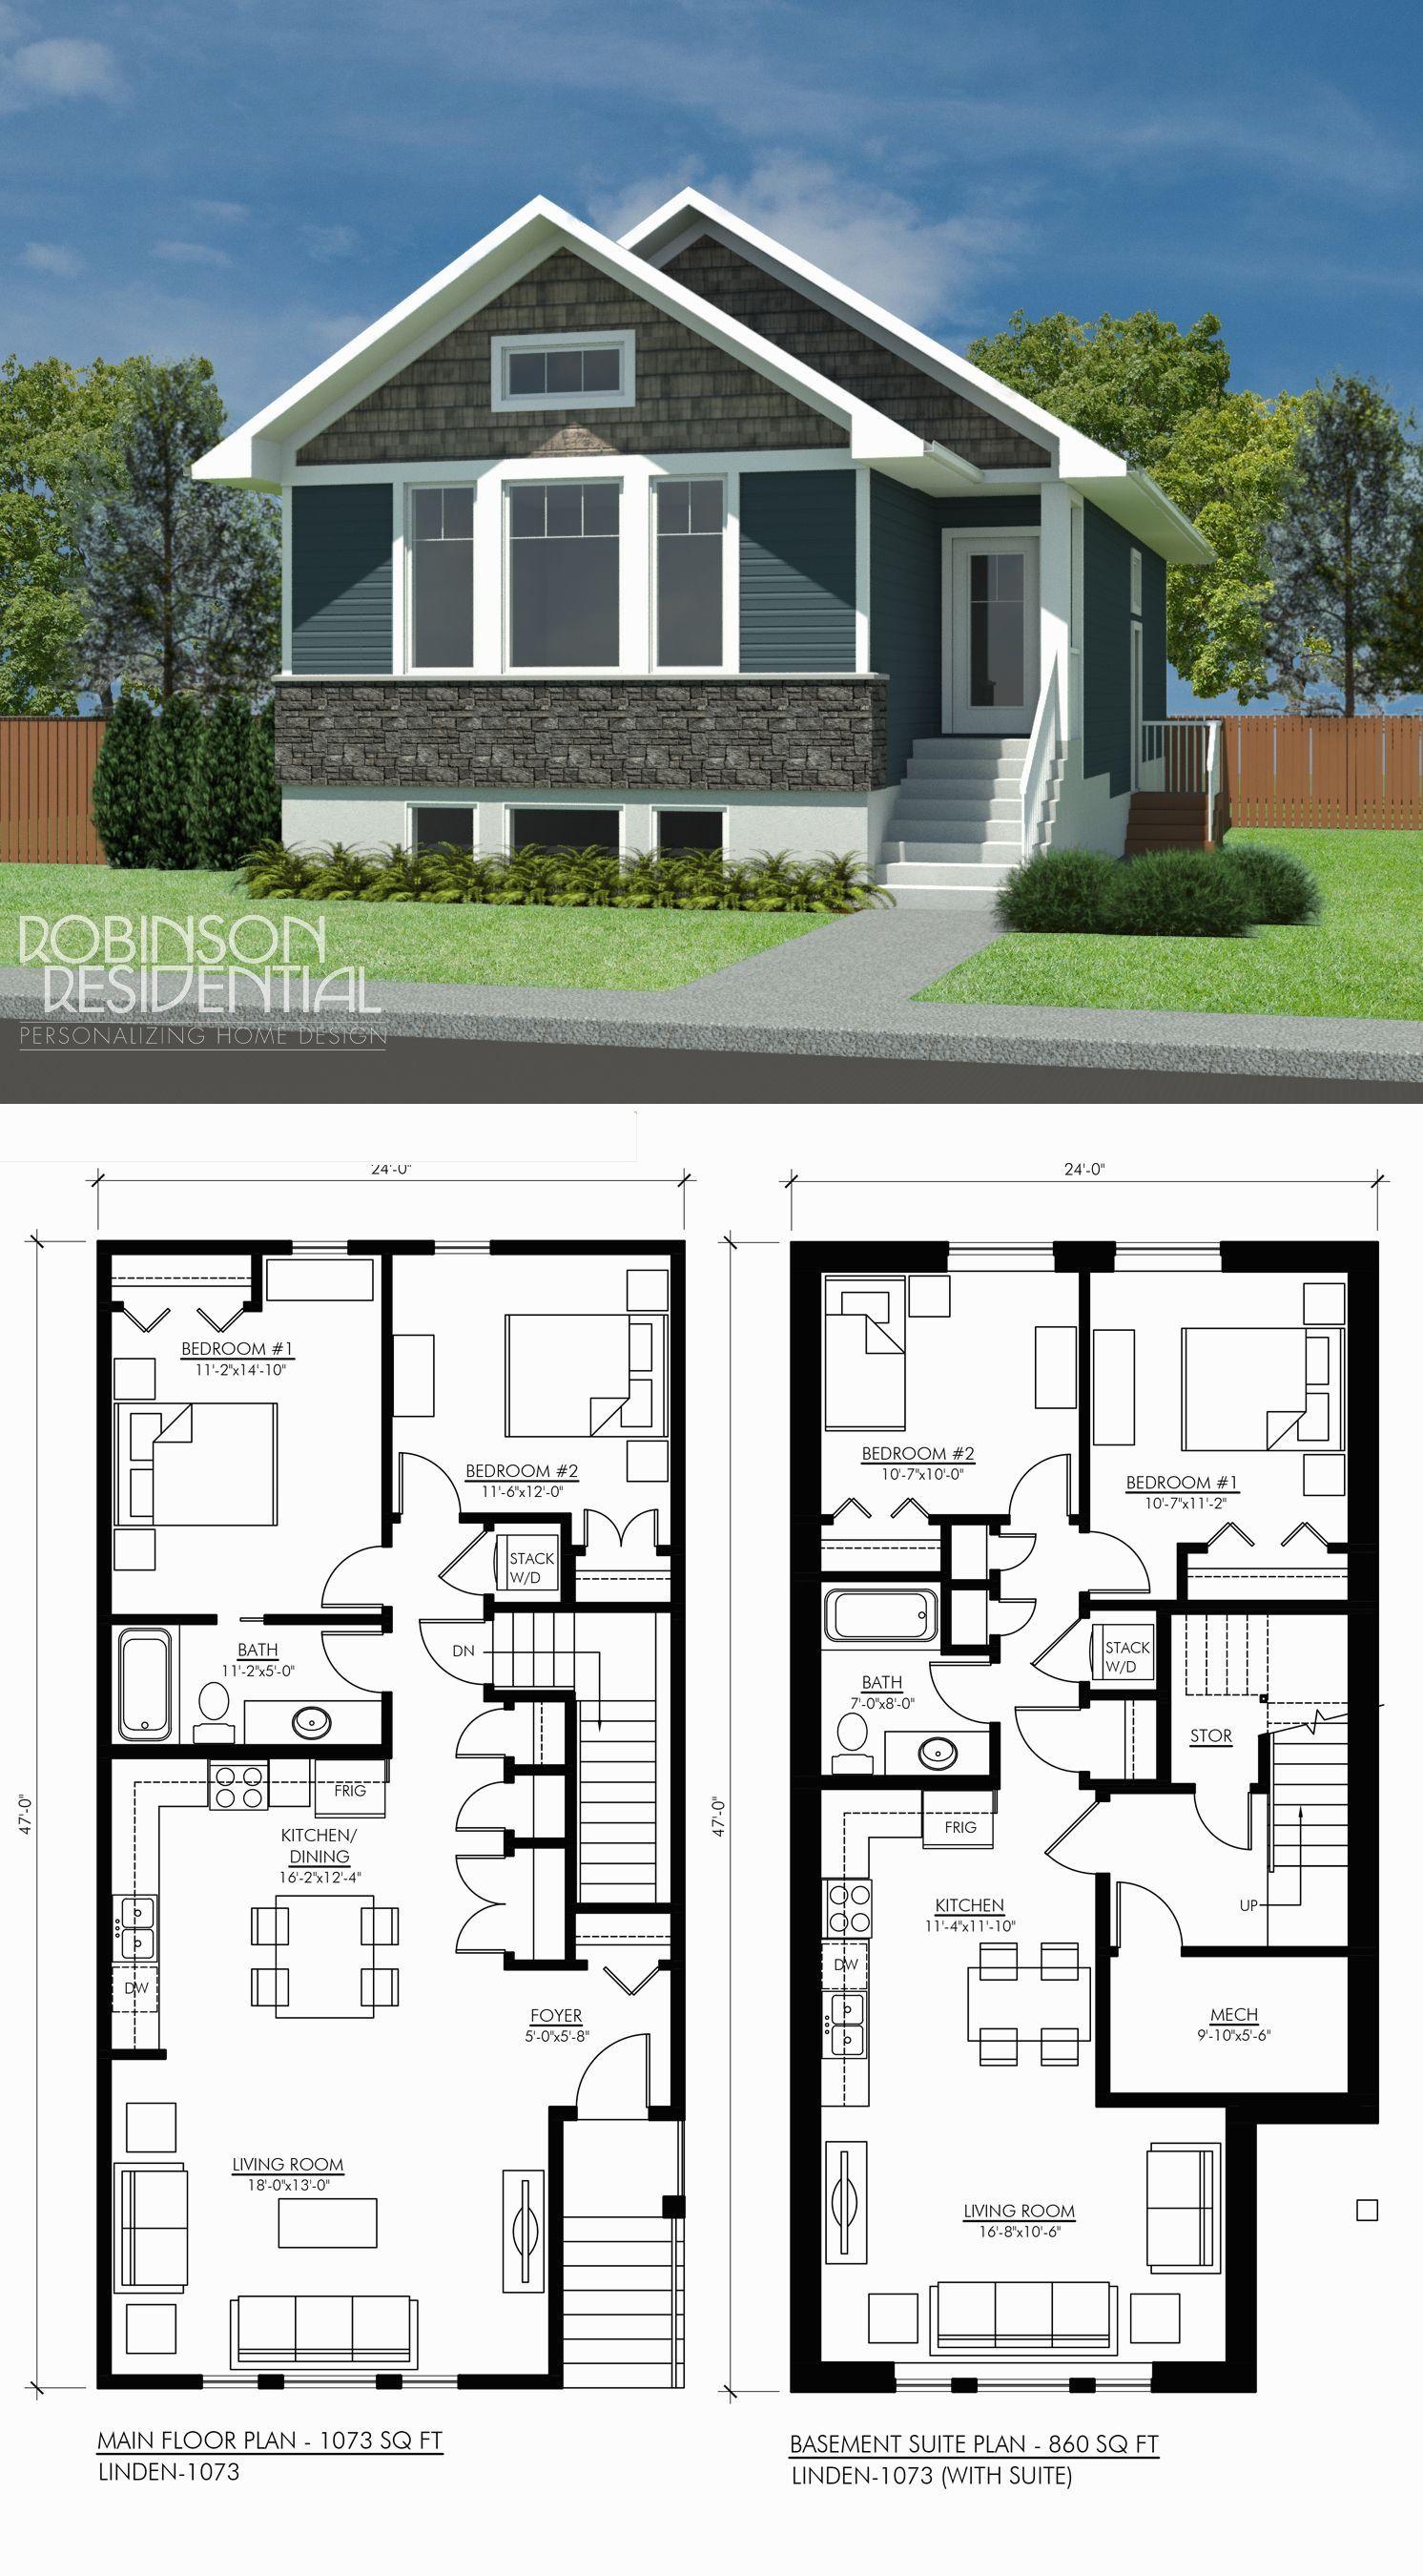 Home Designs For Long Narrow Blocks Basement House Plans New House Plans House Plans